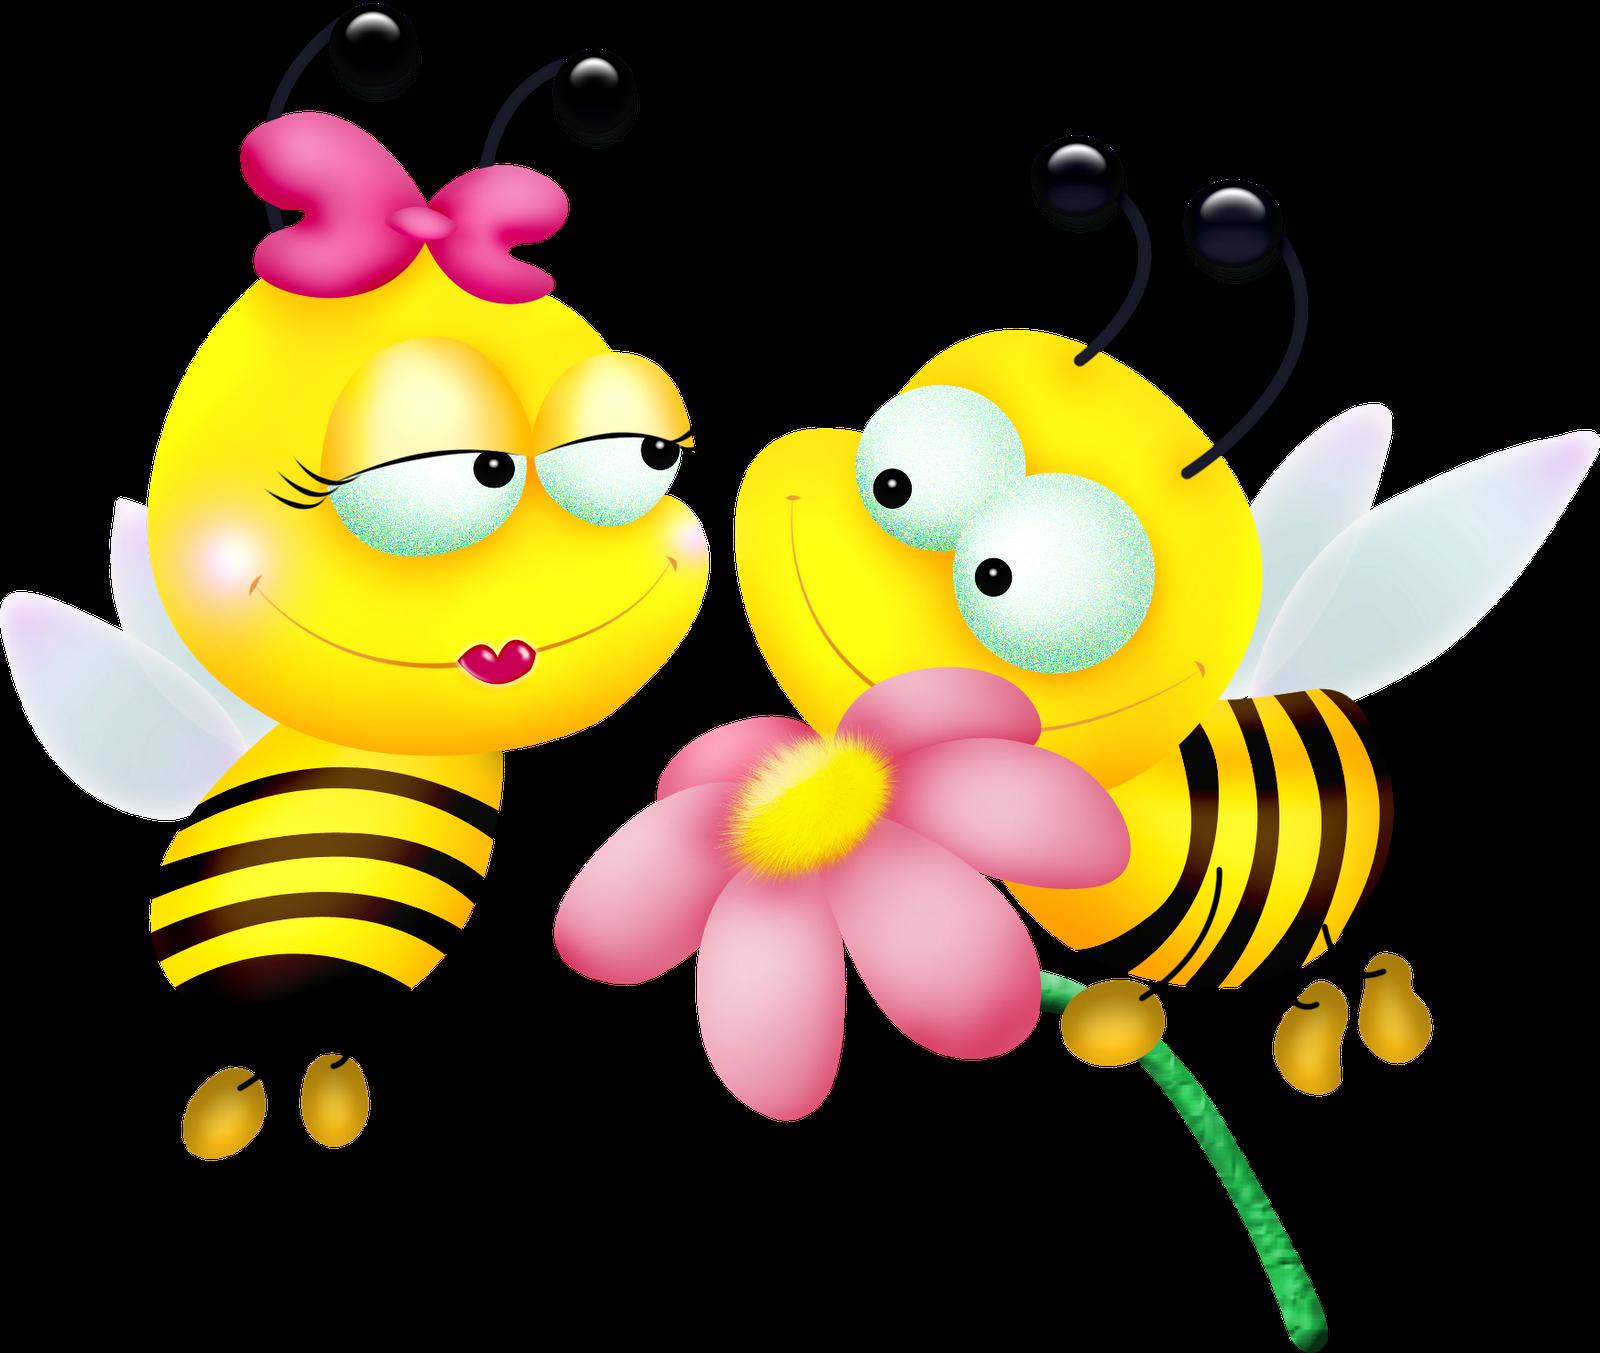 L minas infantiles y. Honey clipart animated